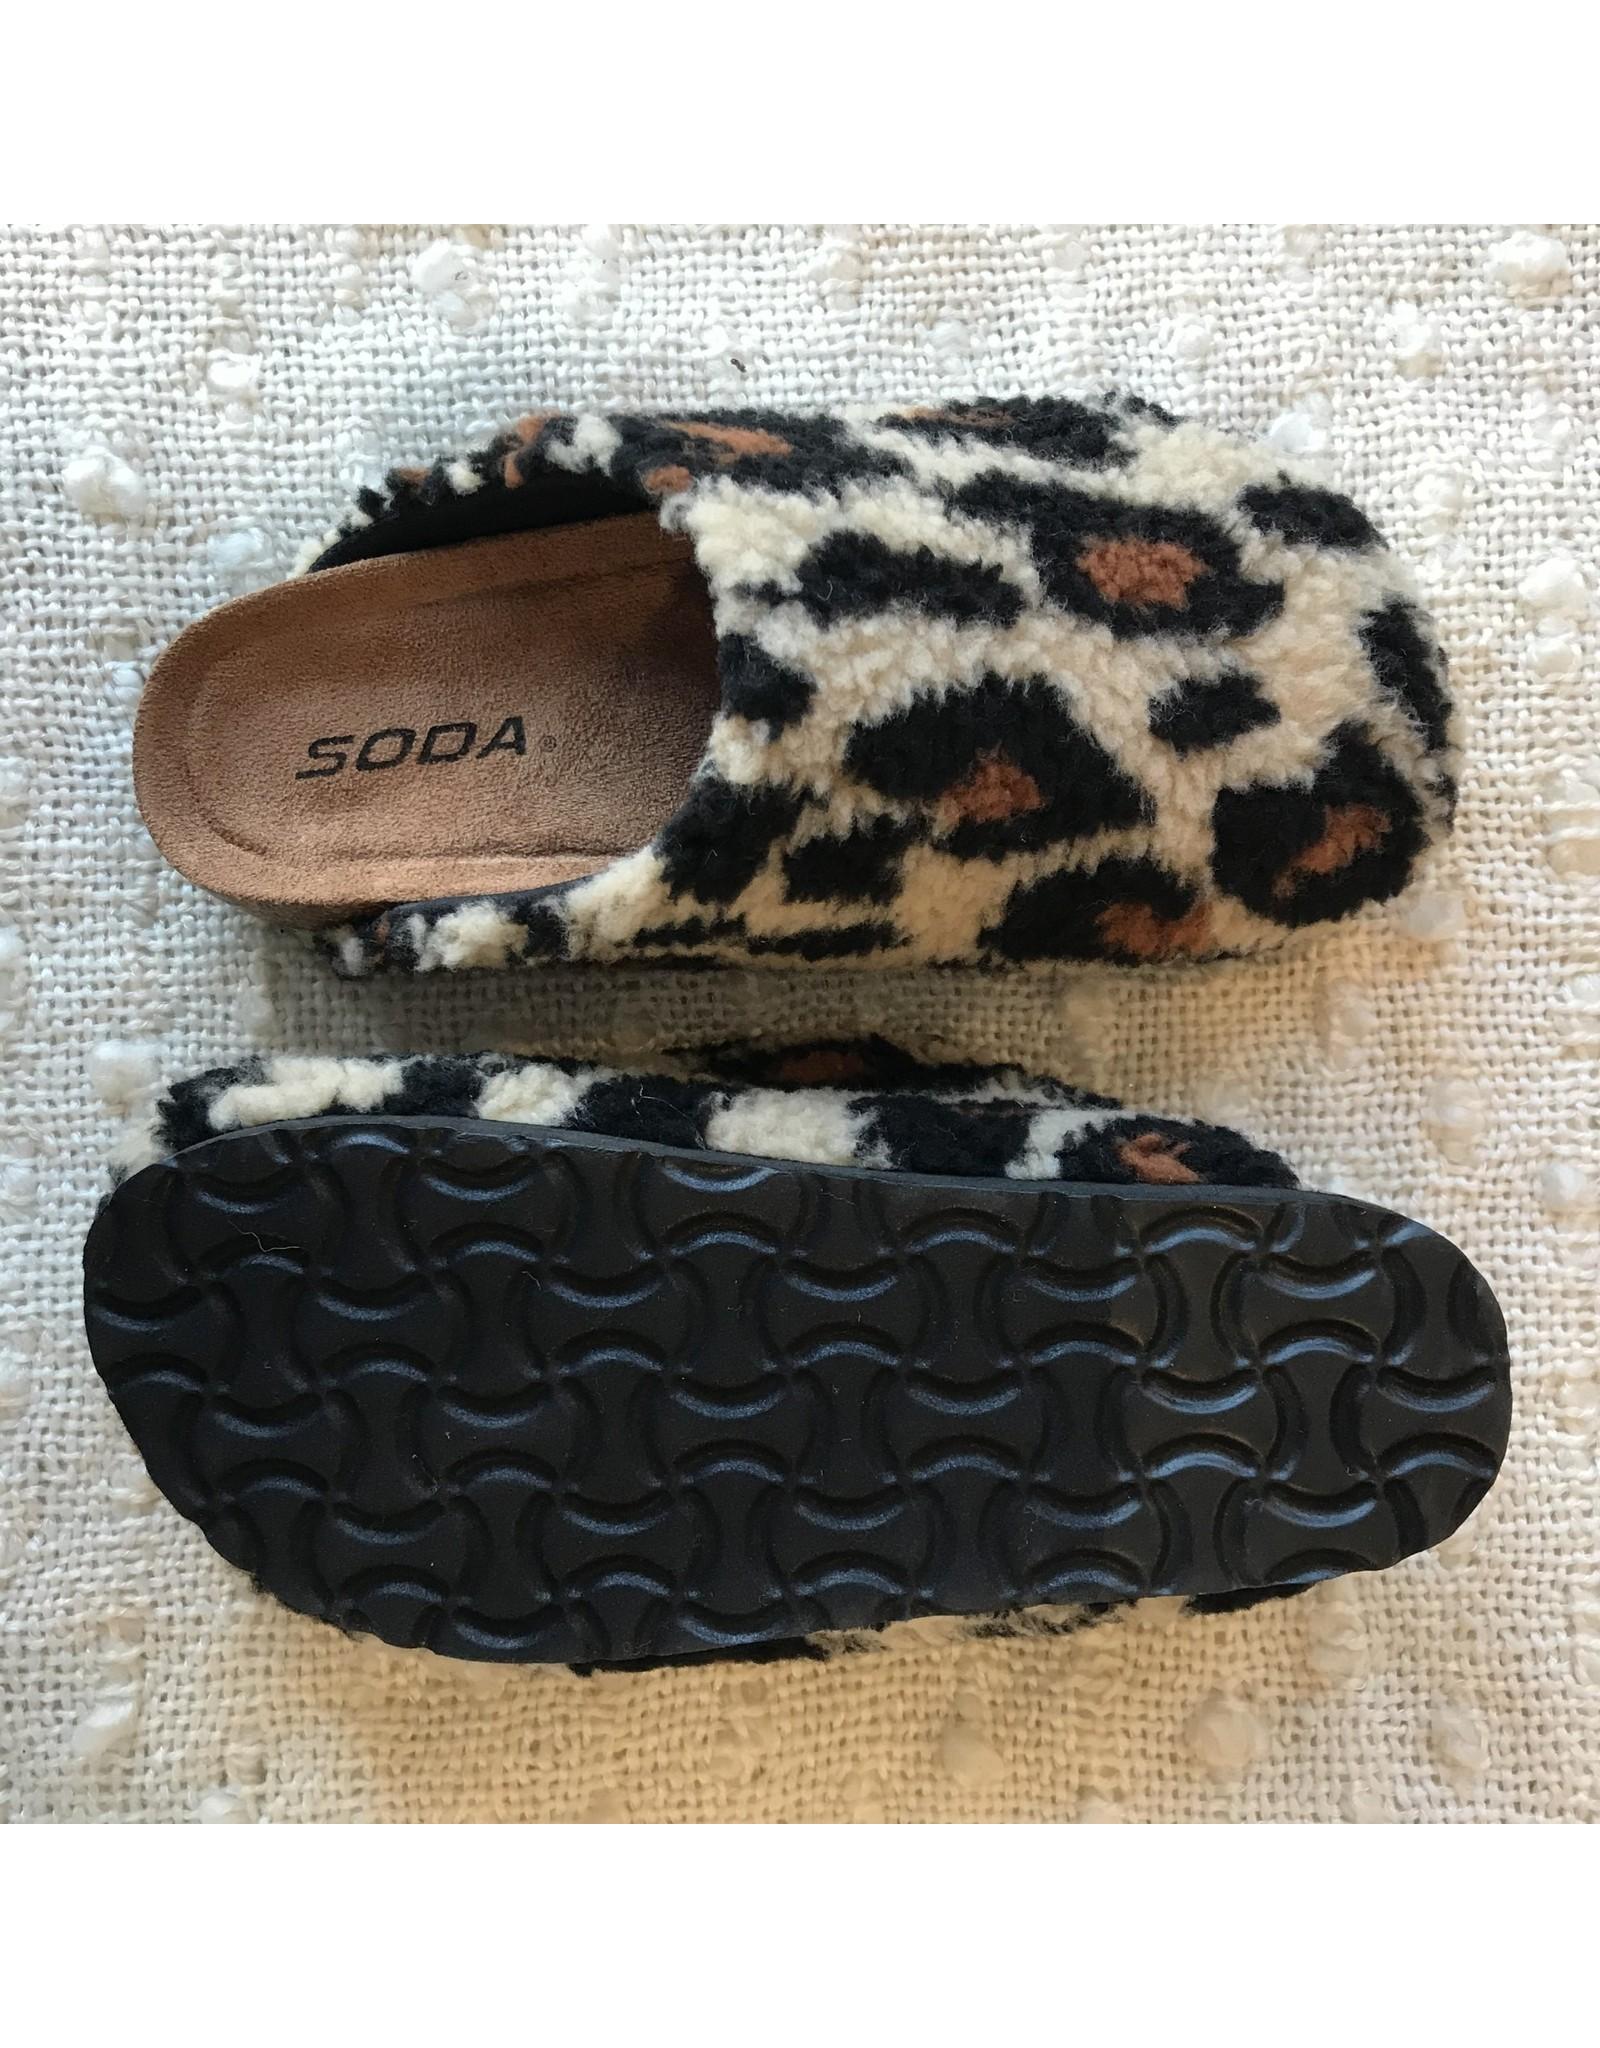 Soda Kylie - Faux fur clogs (leopard)